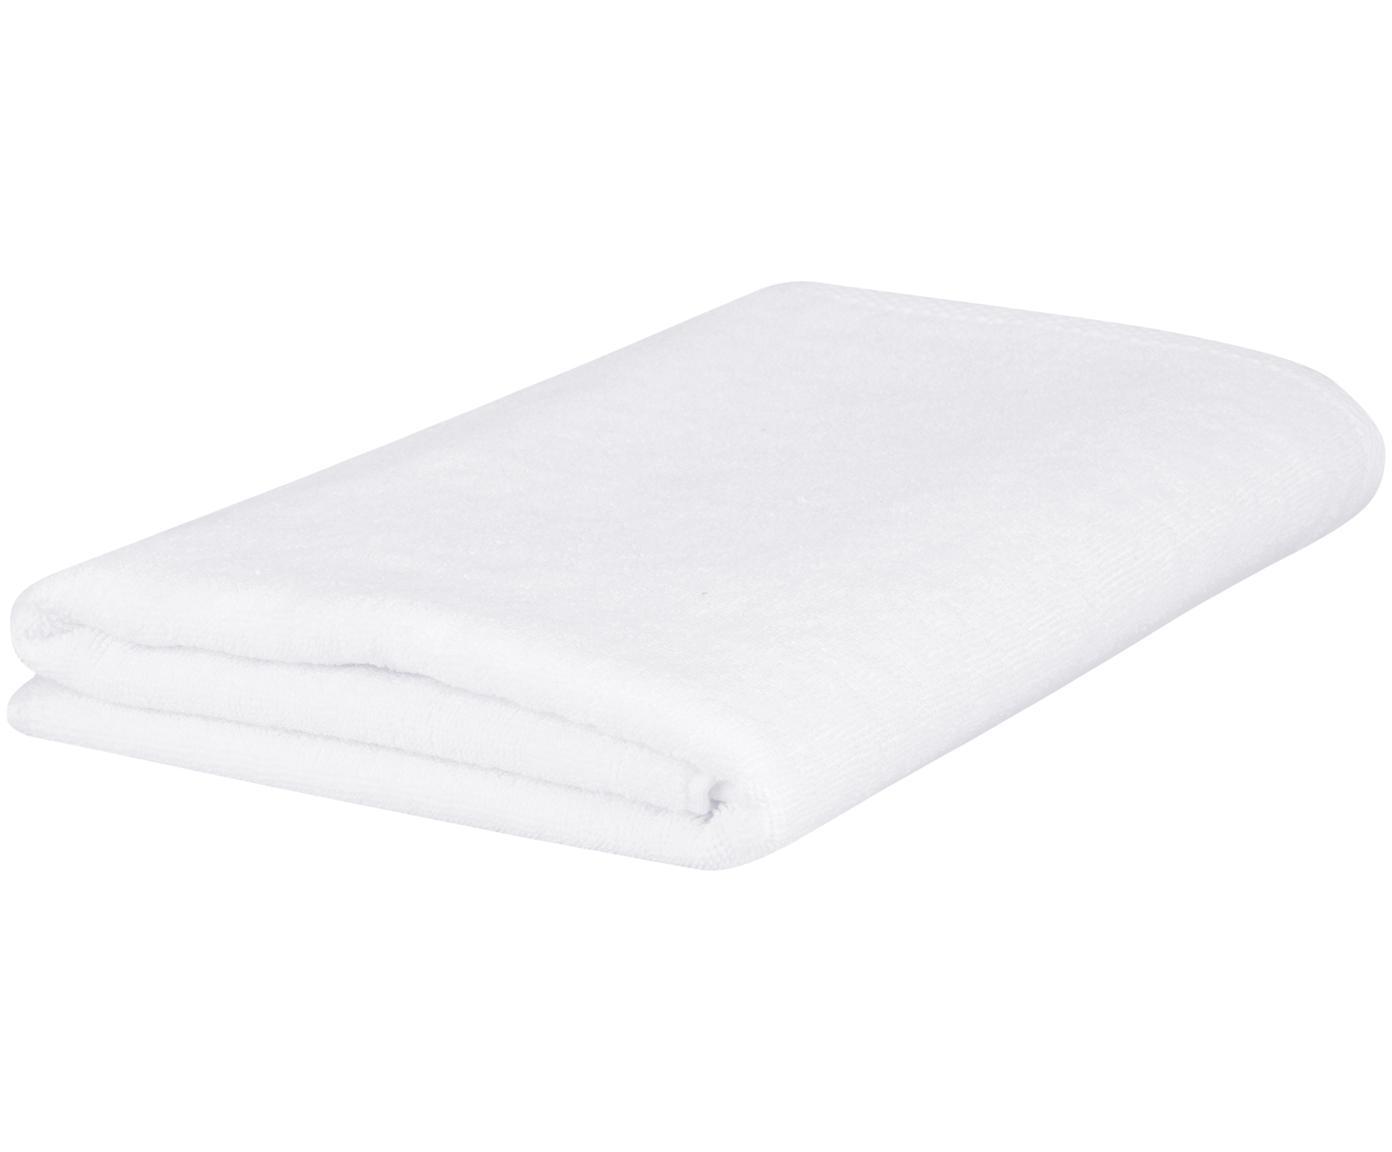 Handdoek Comfort, 100% katoen lichte kwaliteit, 450 g/m², Wit, Gastenhanddoek